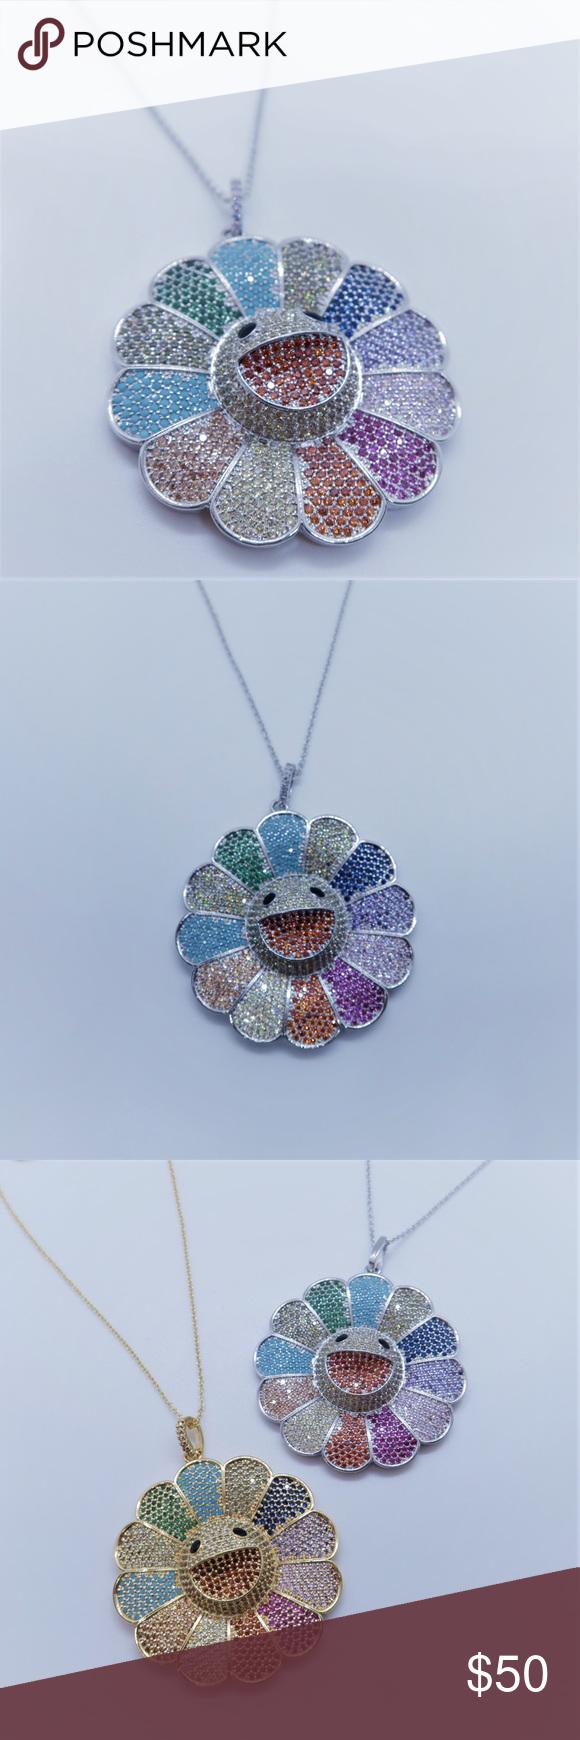 Pin by javenchy_ 💎 on Fashion Murakami flower, Cute